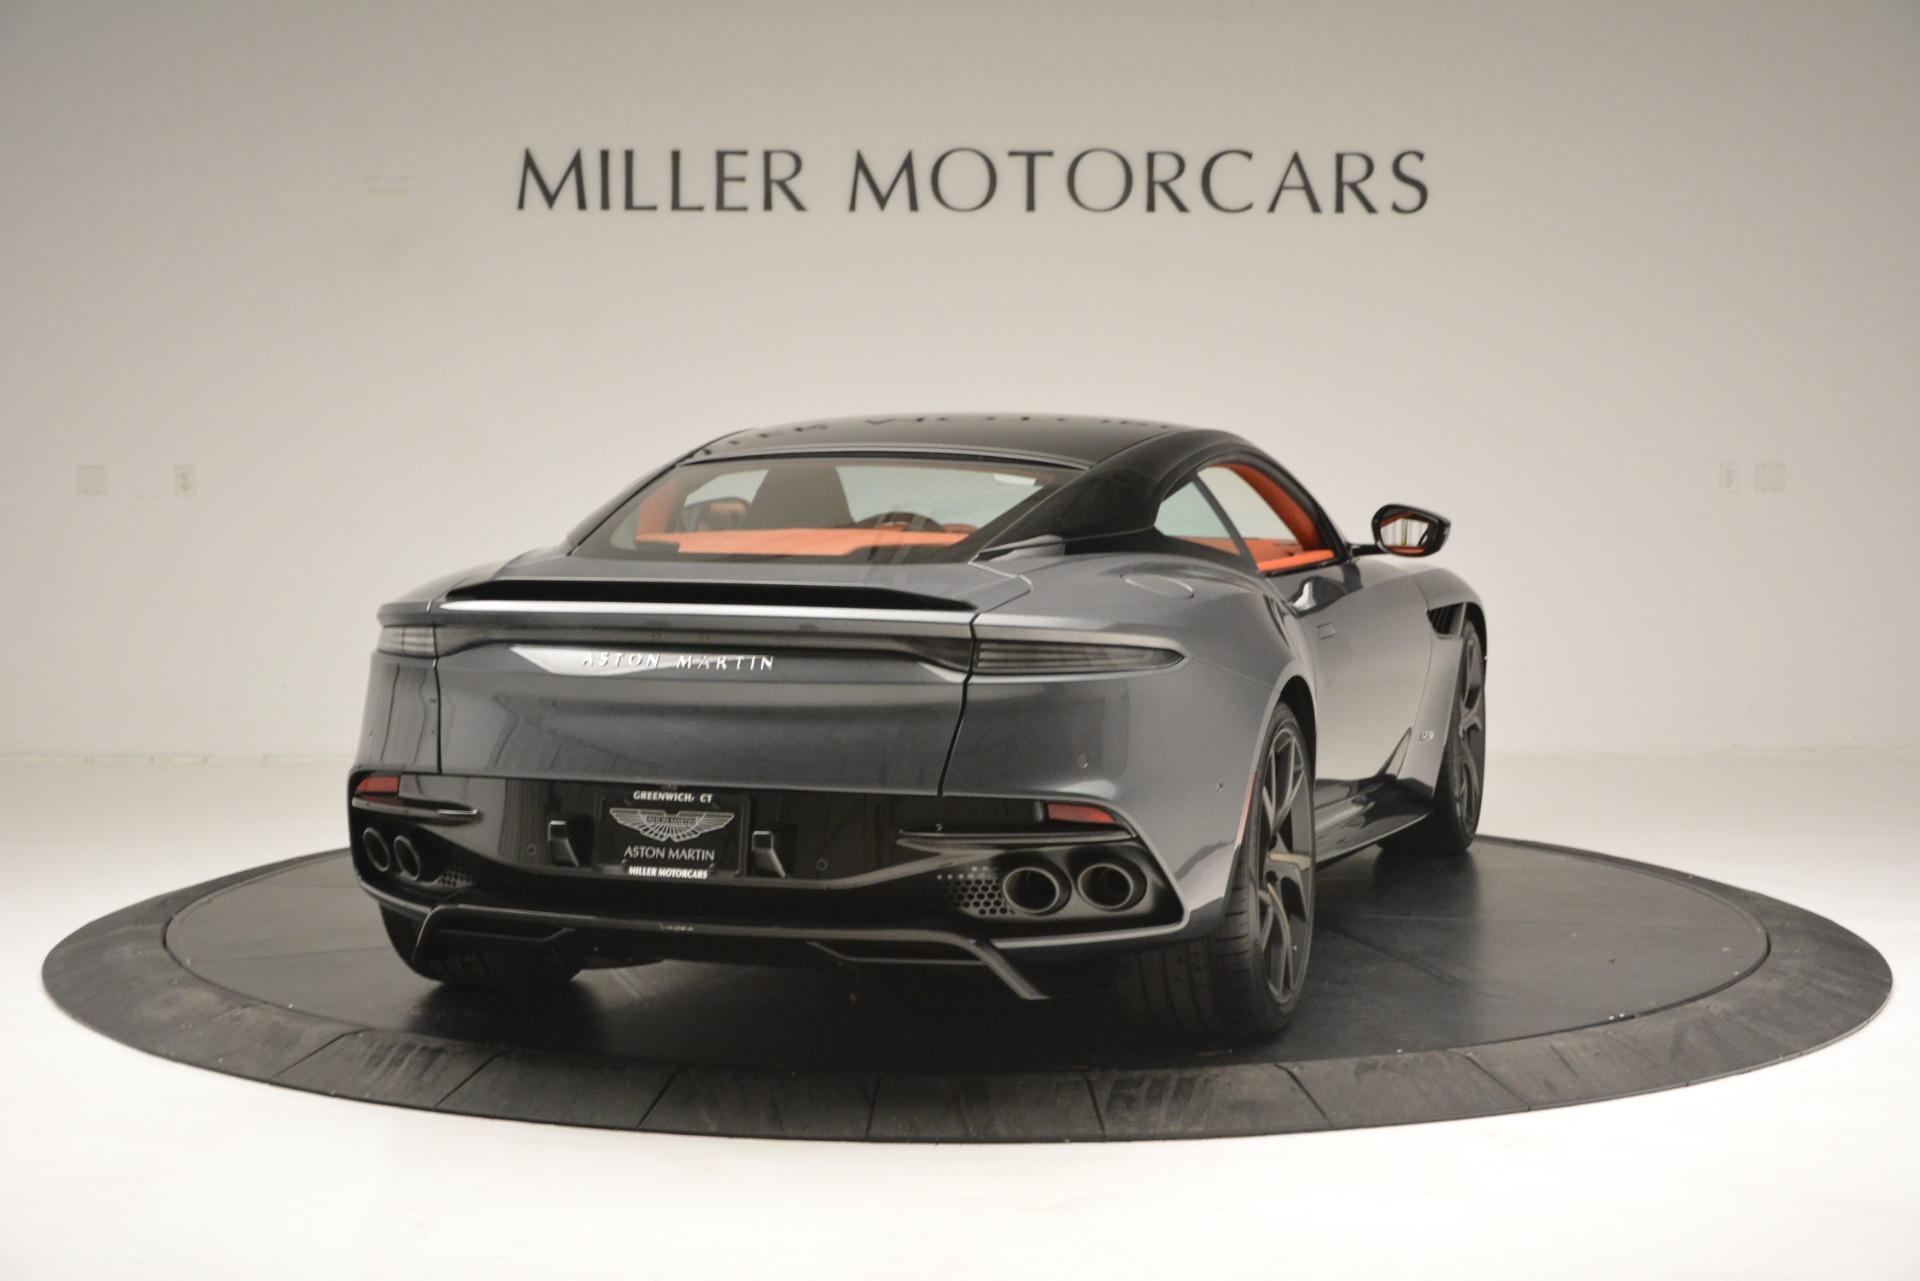 New 2019 Aston Martin DBS Superleggera For Sale In Greenwich, CT. Alfa Romeo of Greenwich, A1336 2827_p7